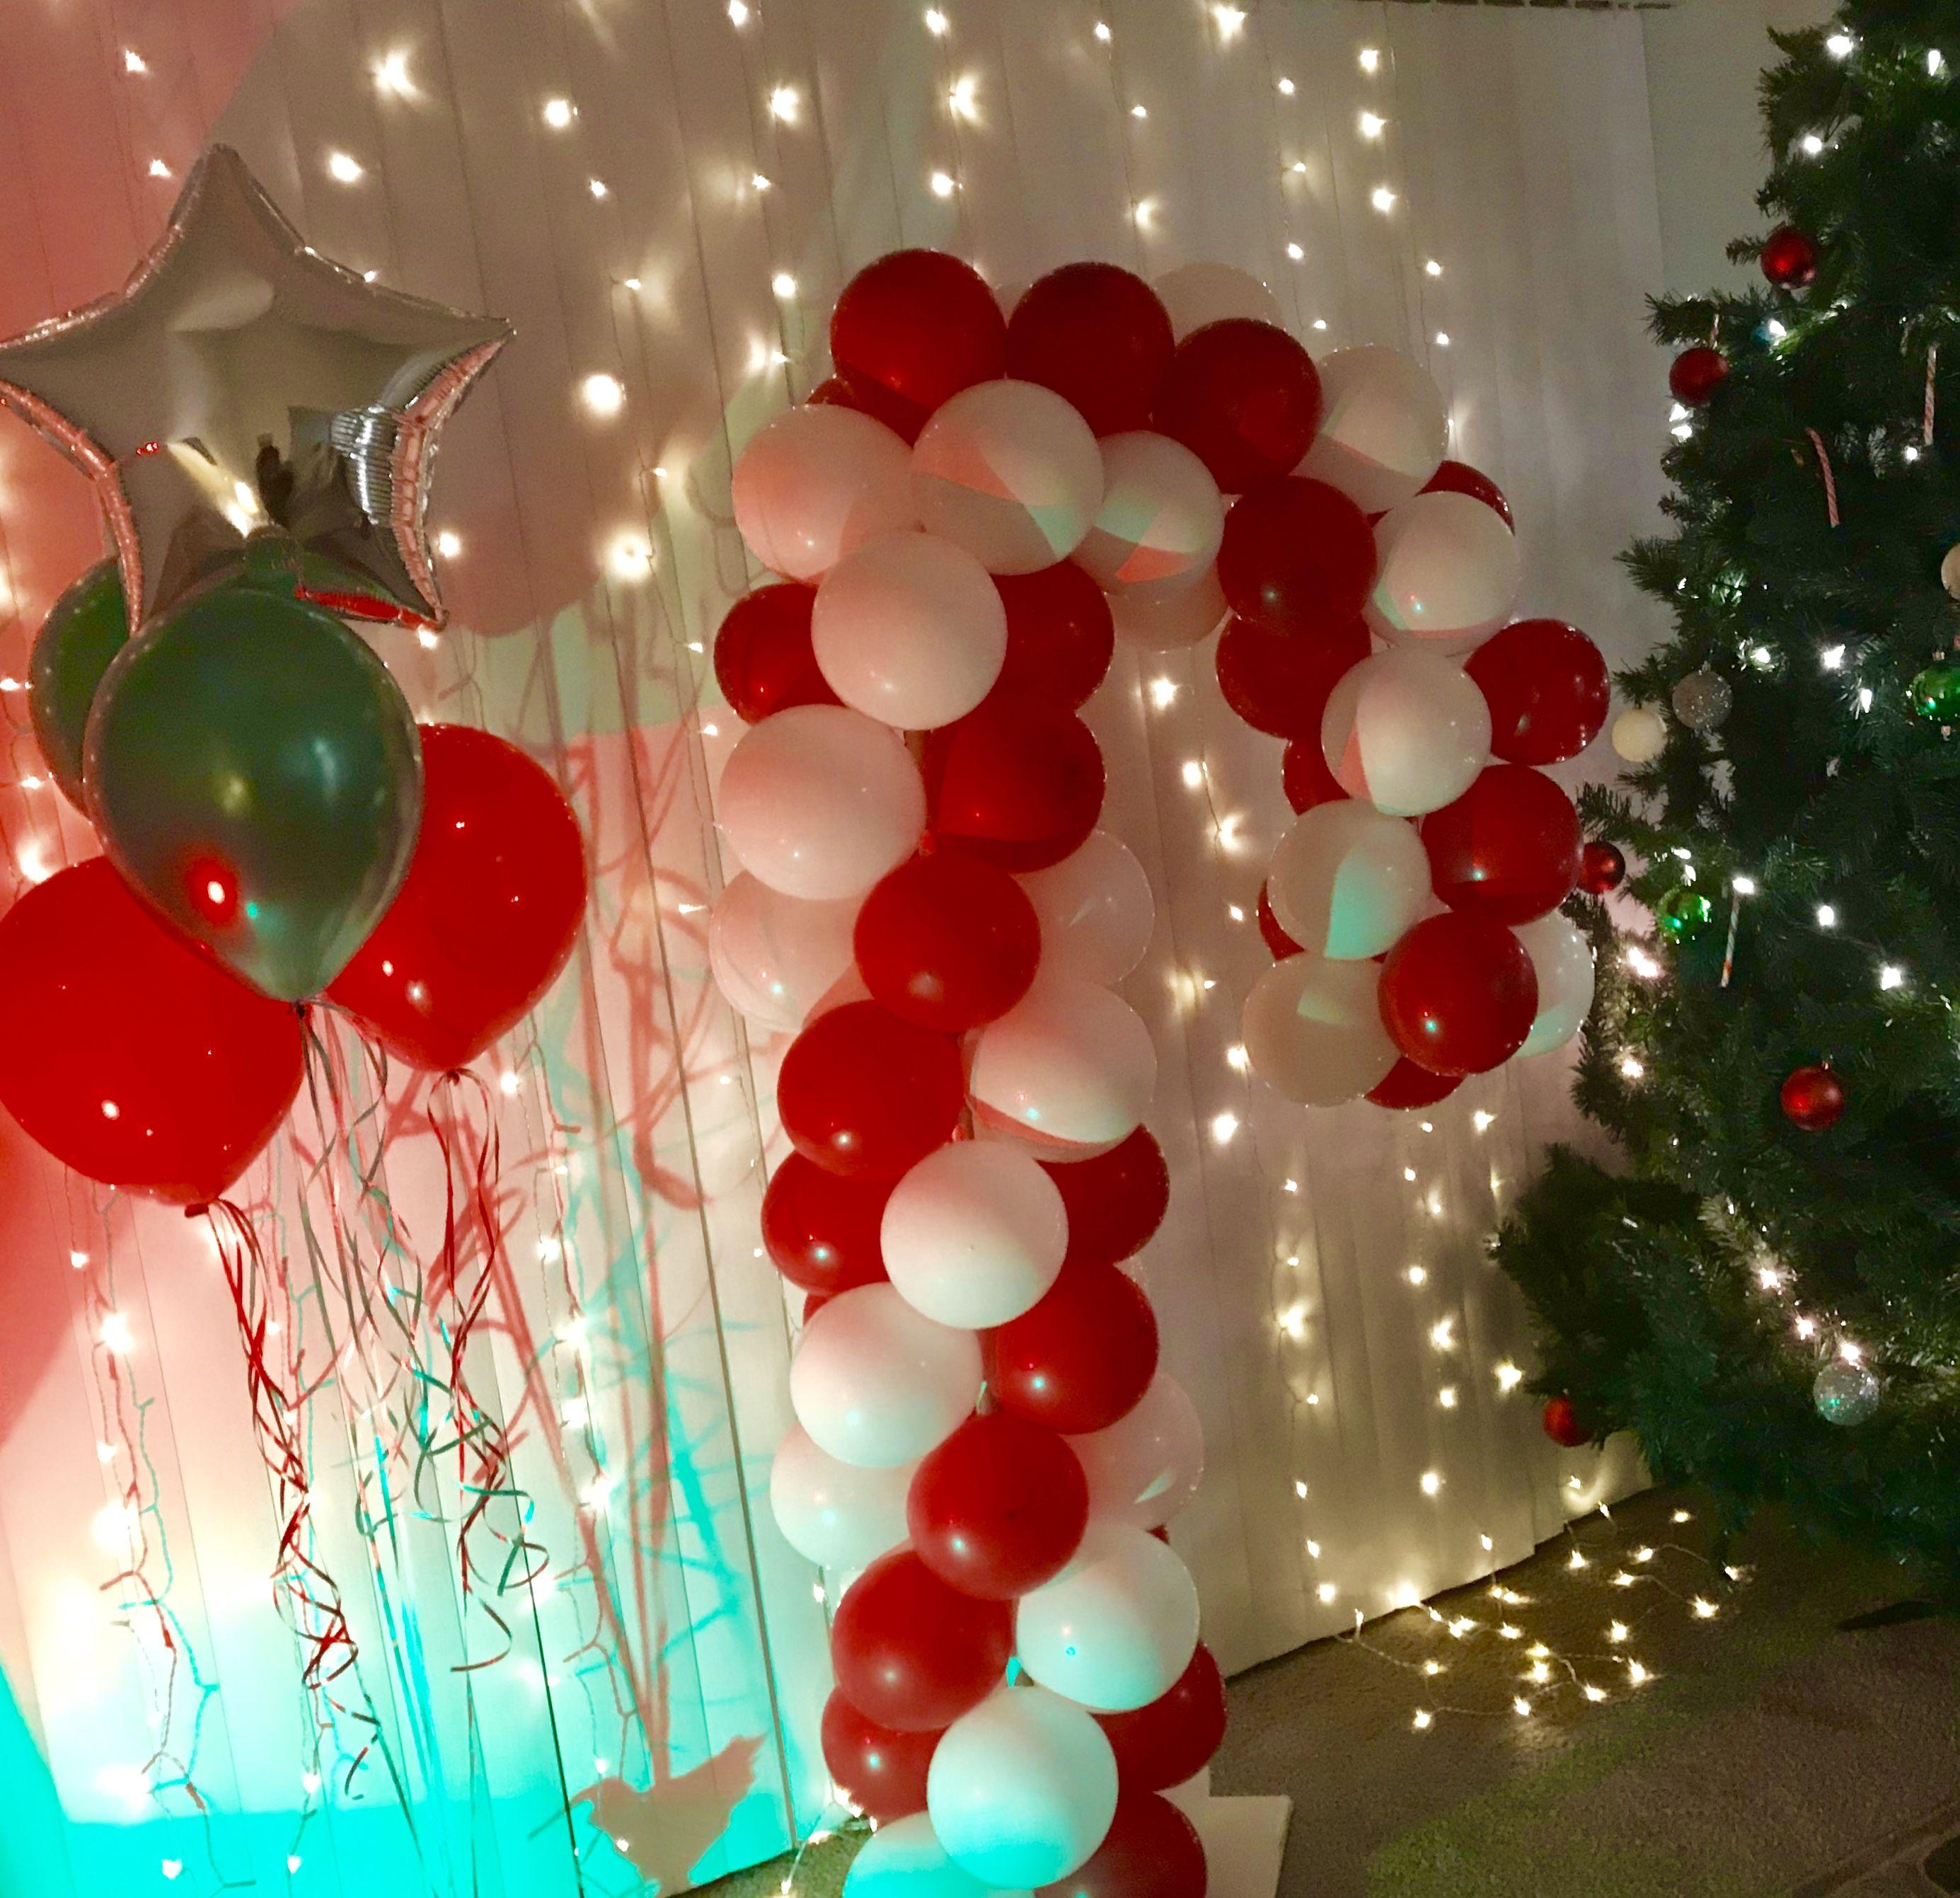 Candy Cane Balloon Columns Christmas Party Decoration Ideas